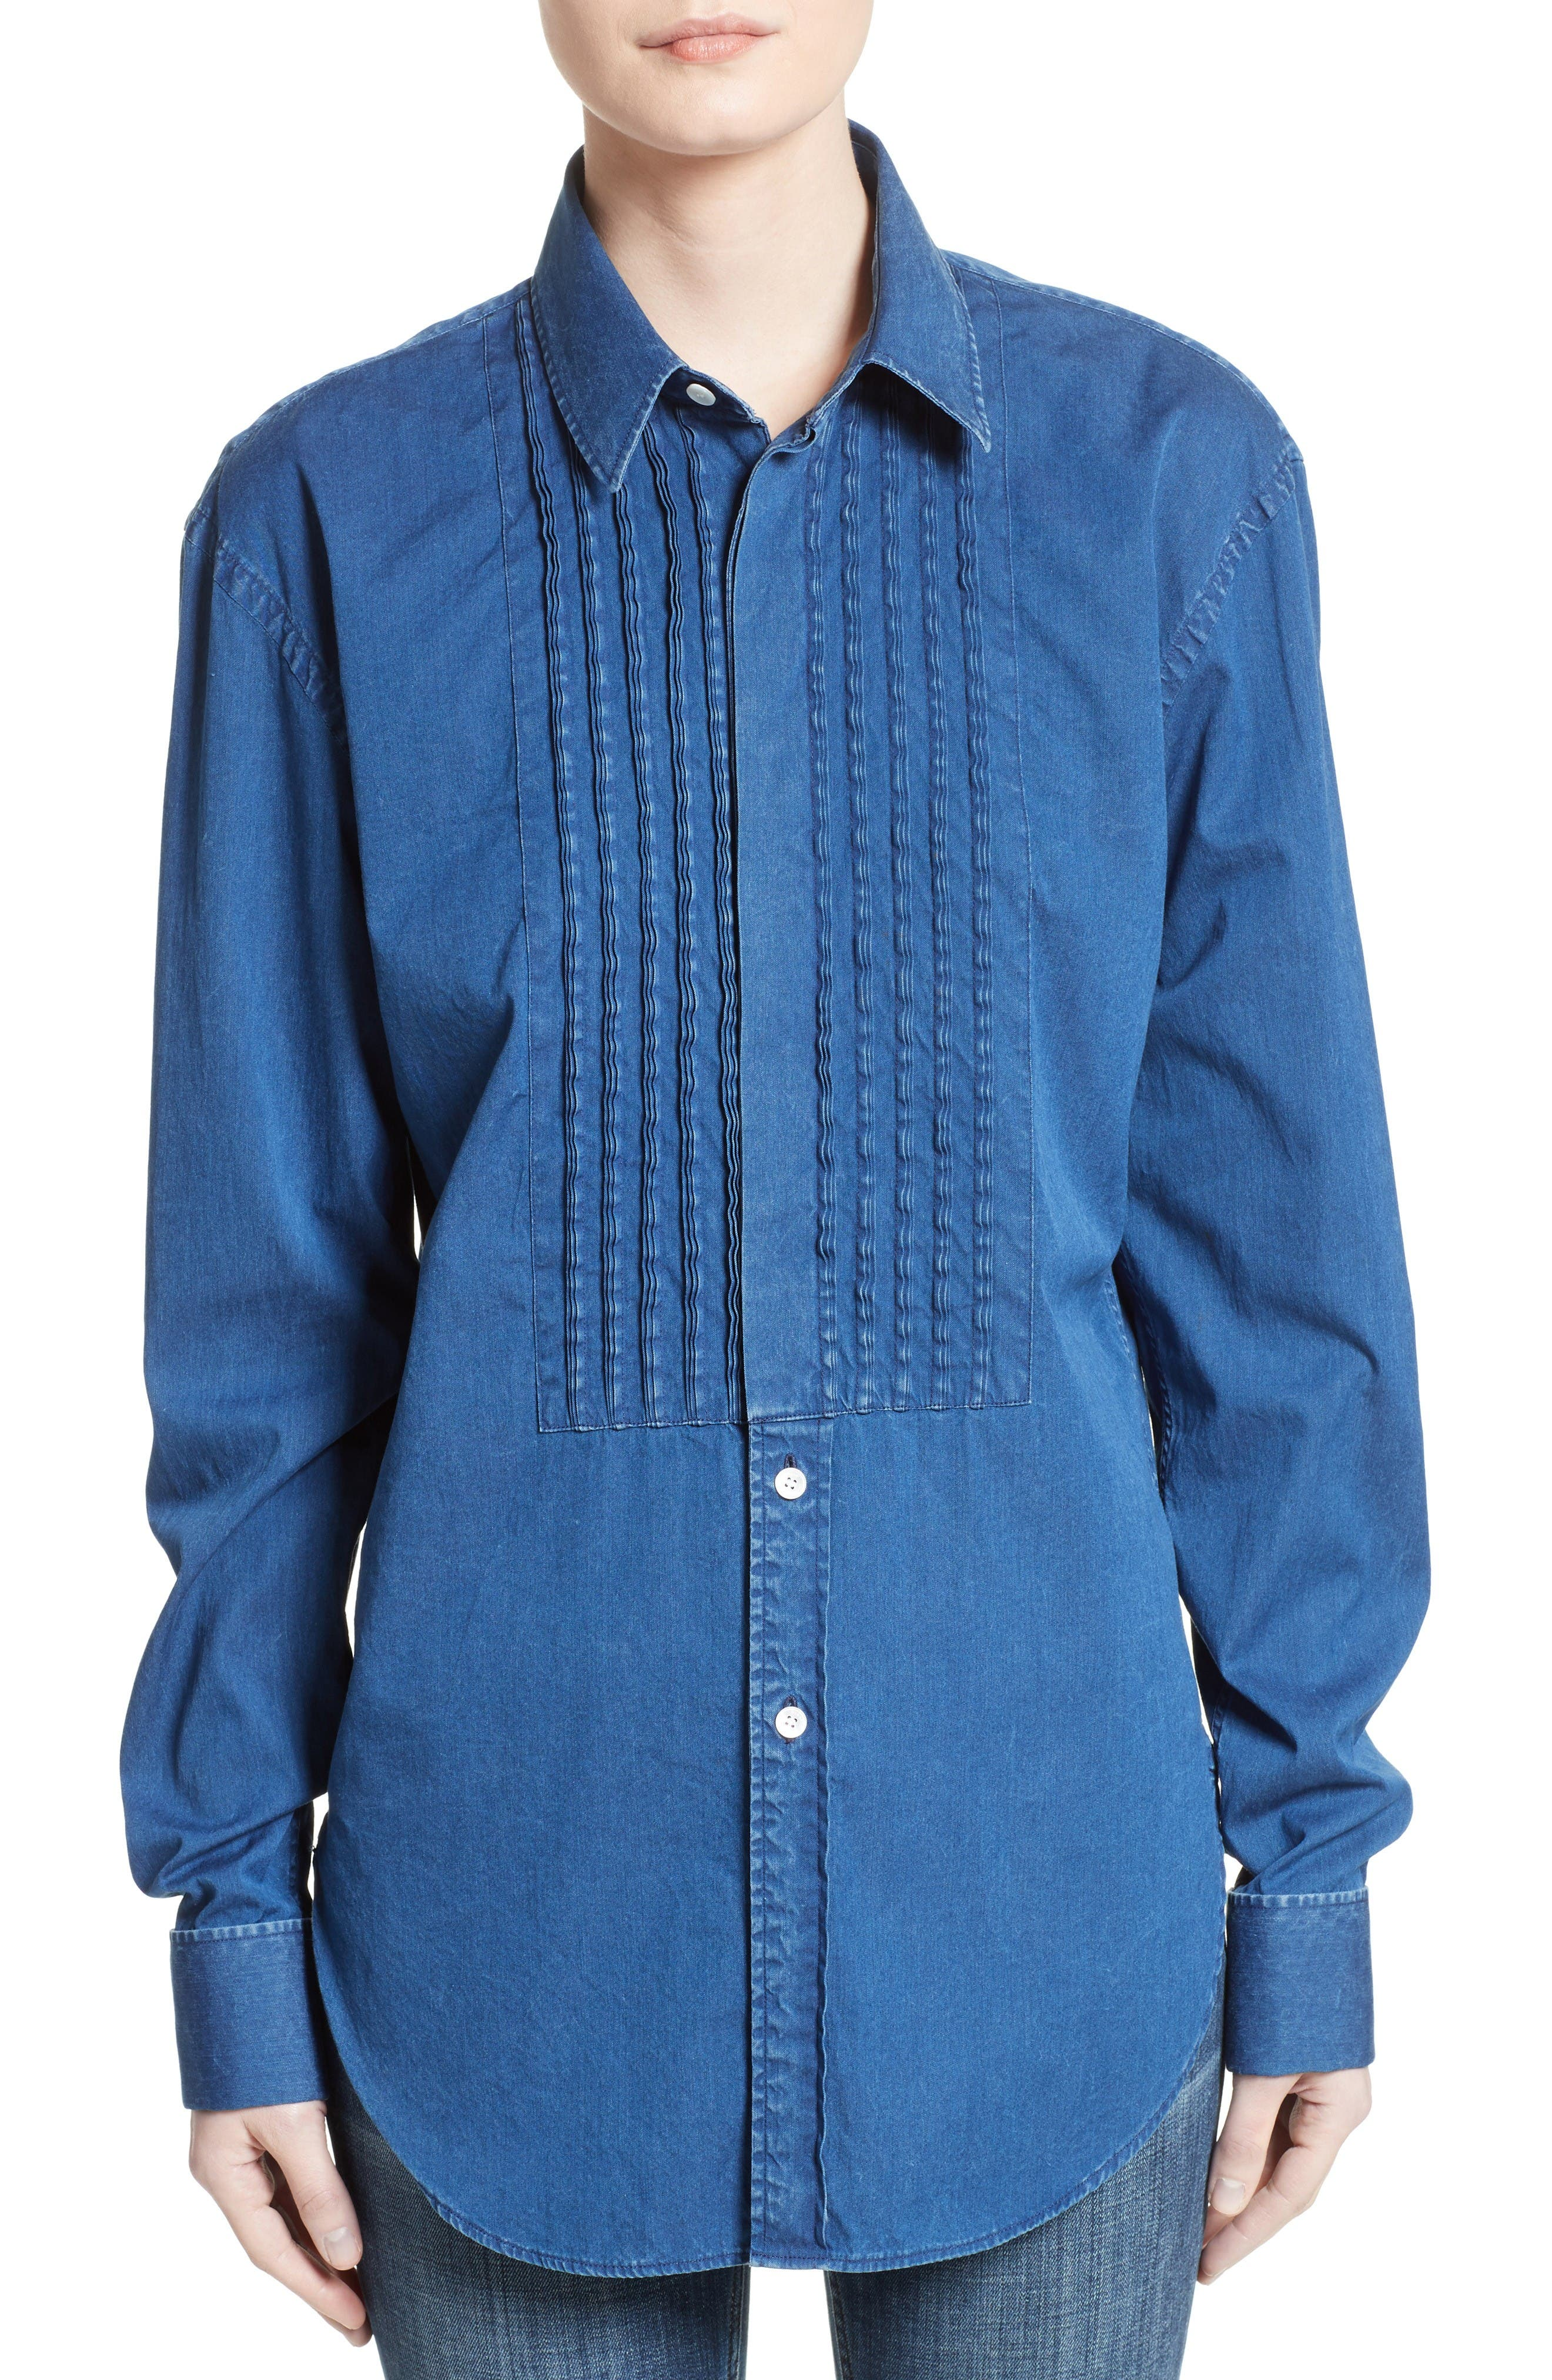 Alternate Image 1 Selected - Burberry Jaden Pintuck Denim Shirt